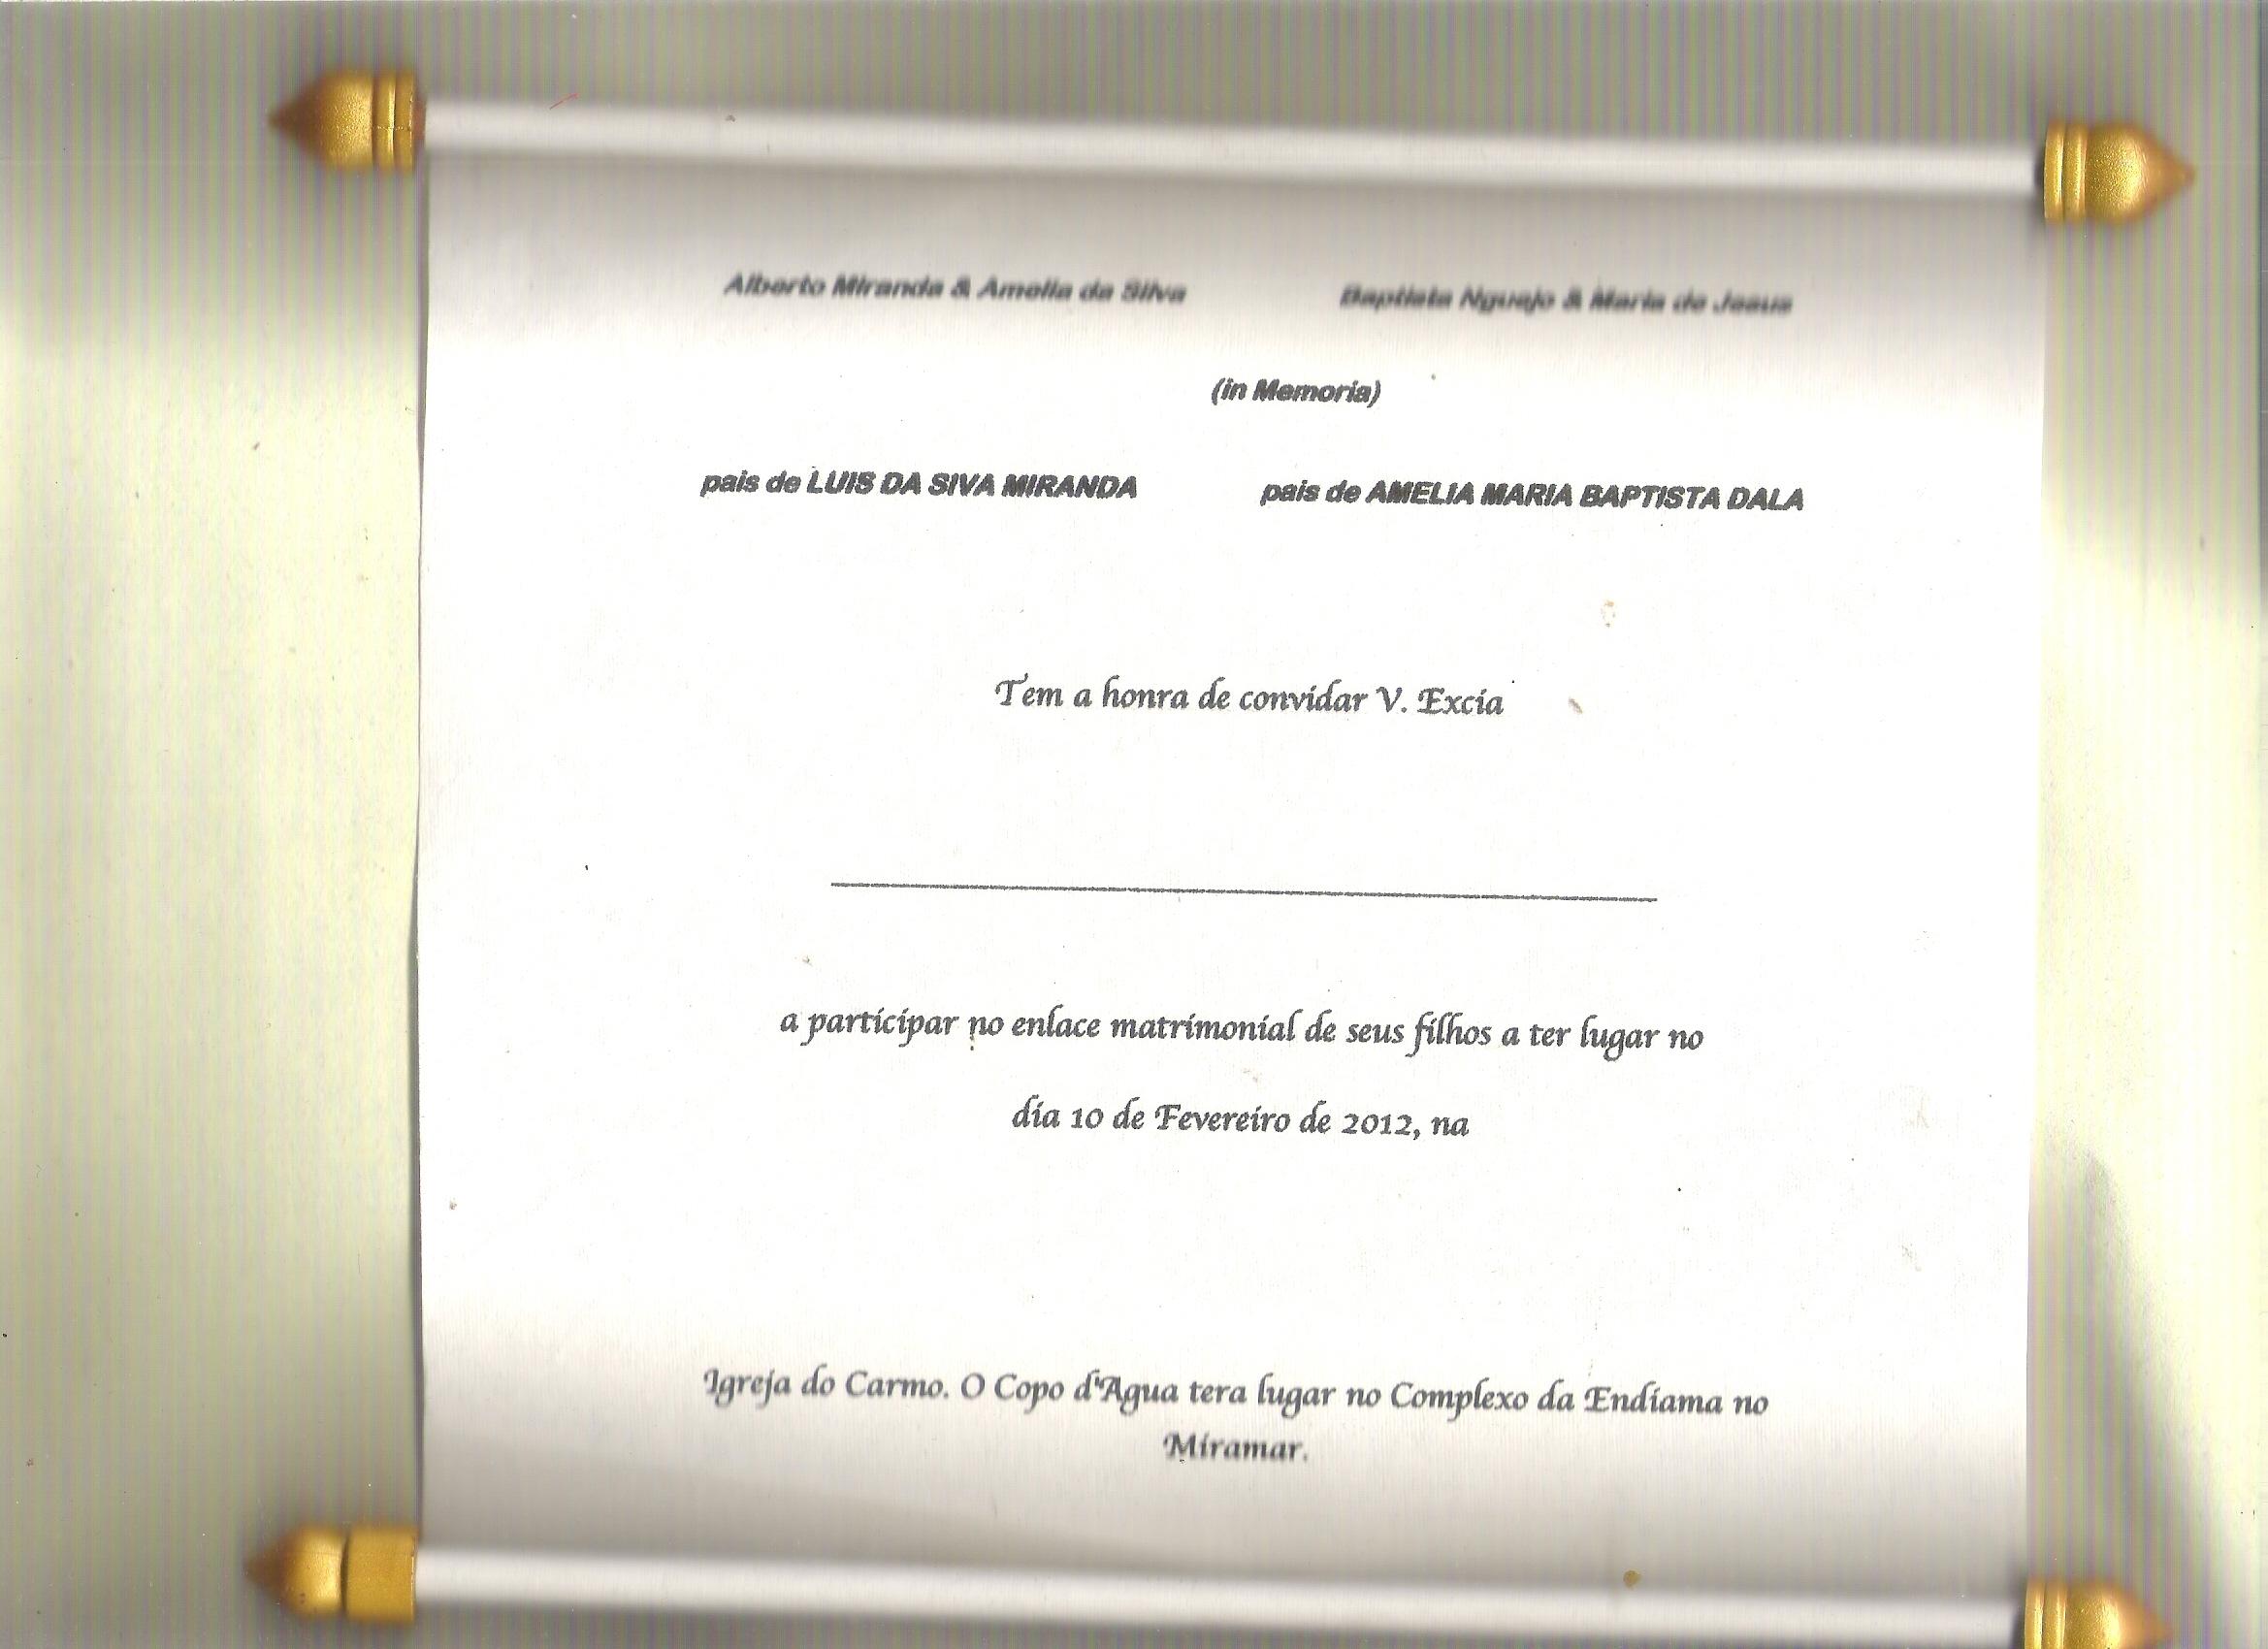 Invitation Cardboard Handmade Paper Scroll Invitations With Custom Prints 2 6 8 Rs 67 Piece Id 2918137655